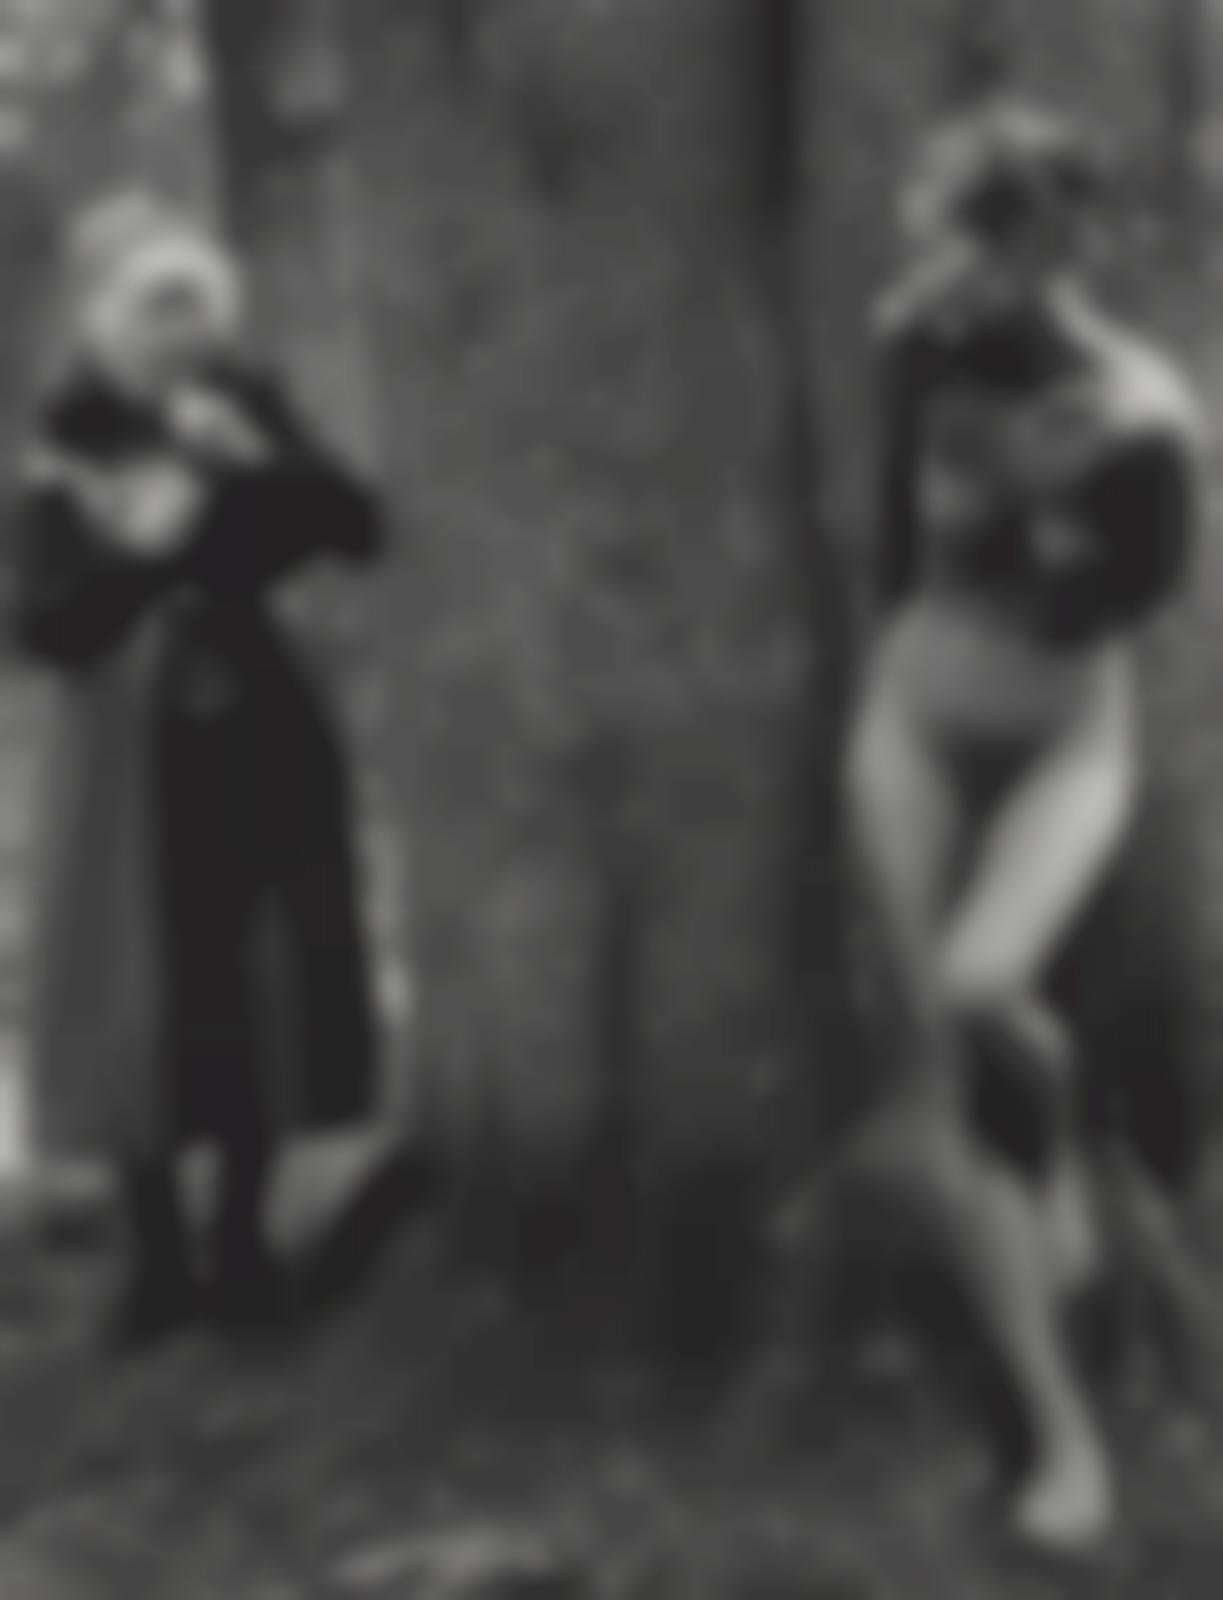 Judy Dater-Imogen Cunningham And Twinka At Yosemite-1974